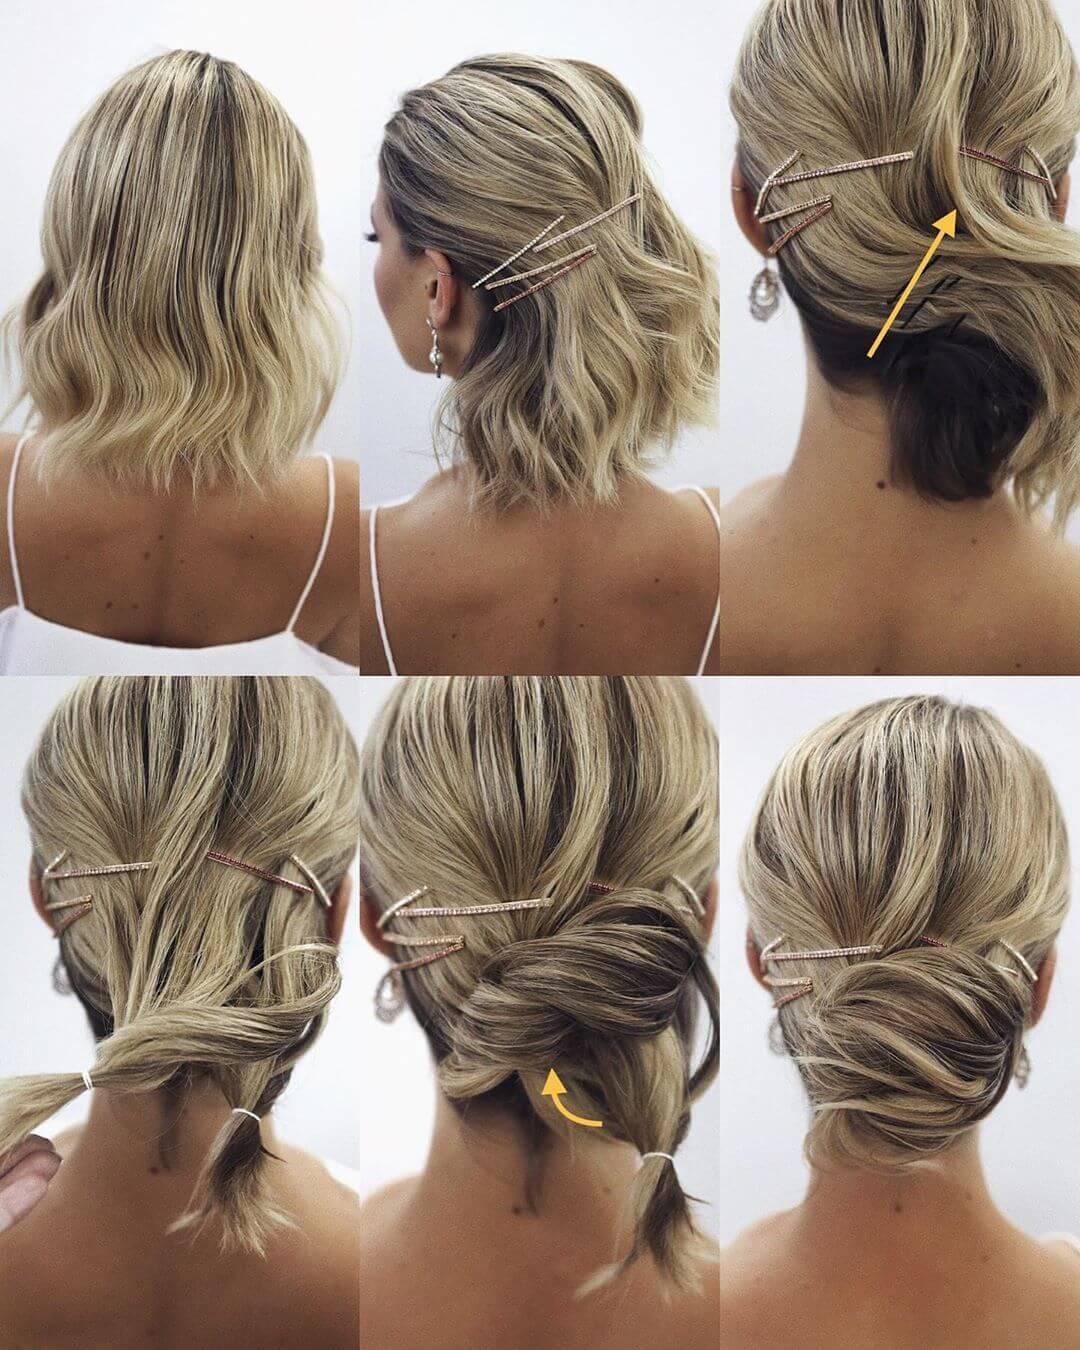 Step by Step Messy wavy lower bun Hairstyles for Long, Medium, Short Hair